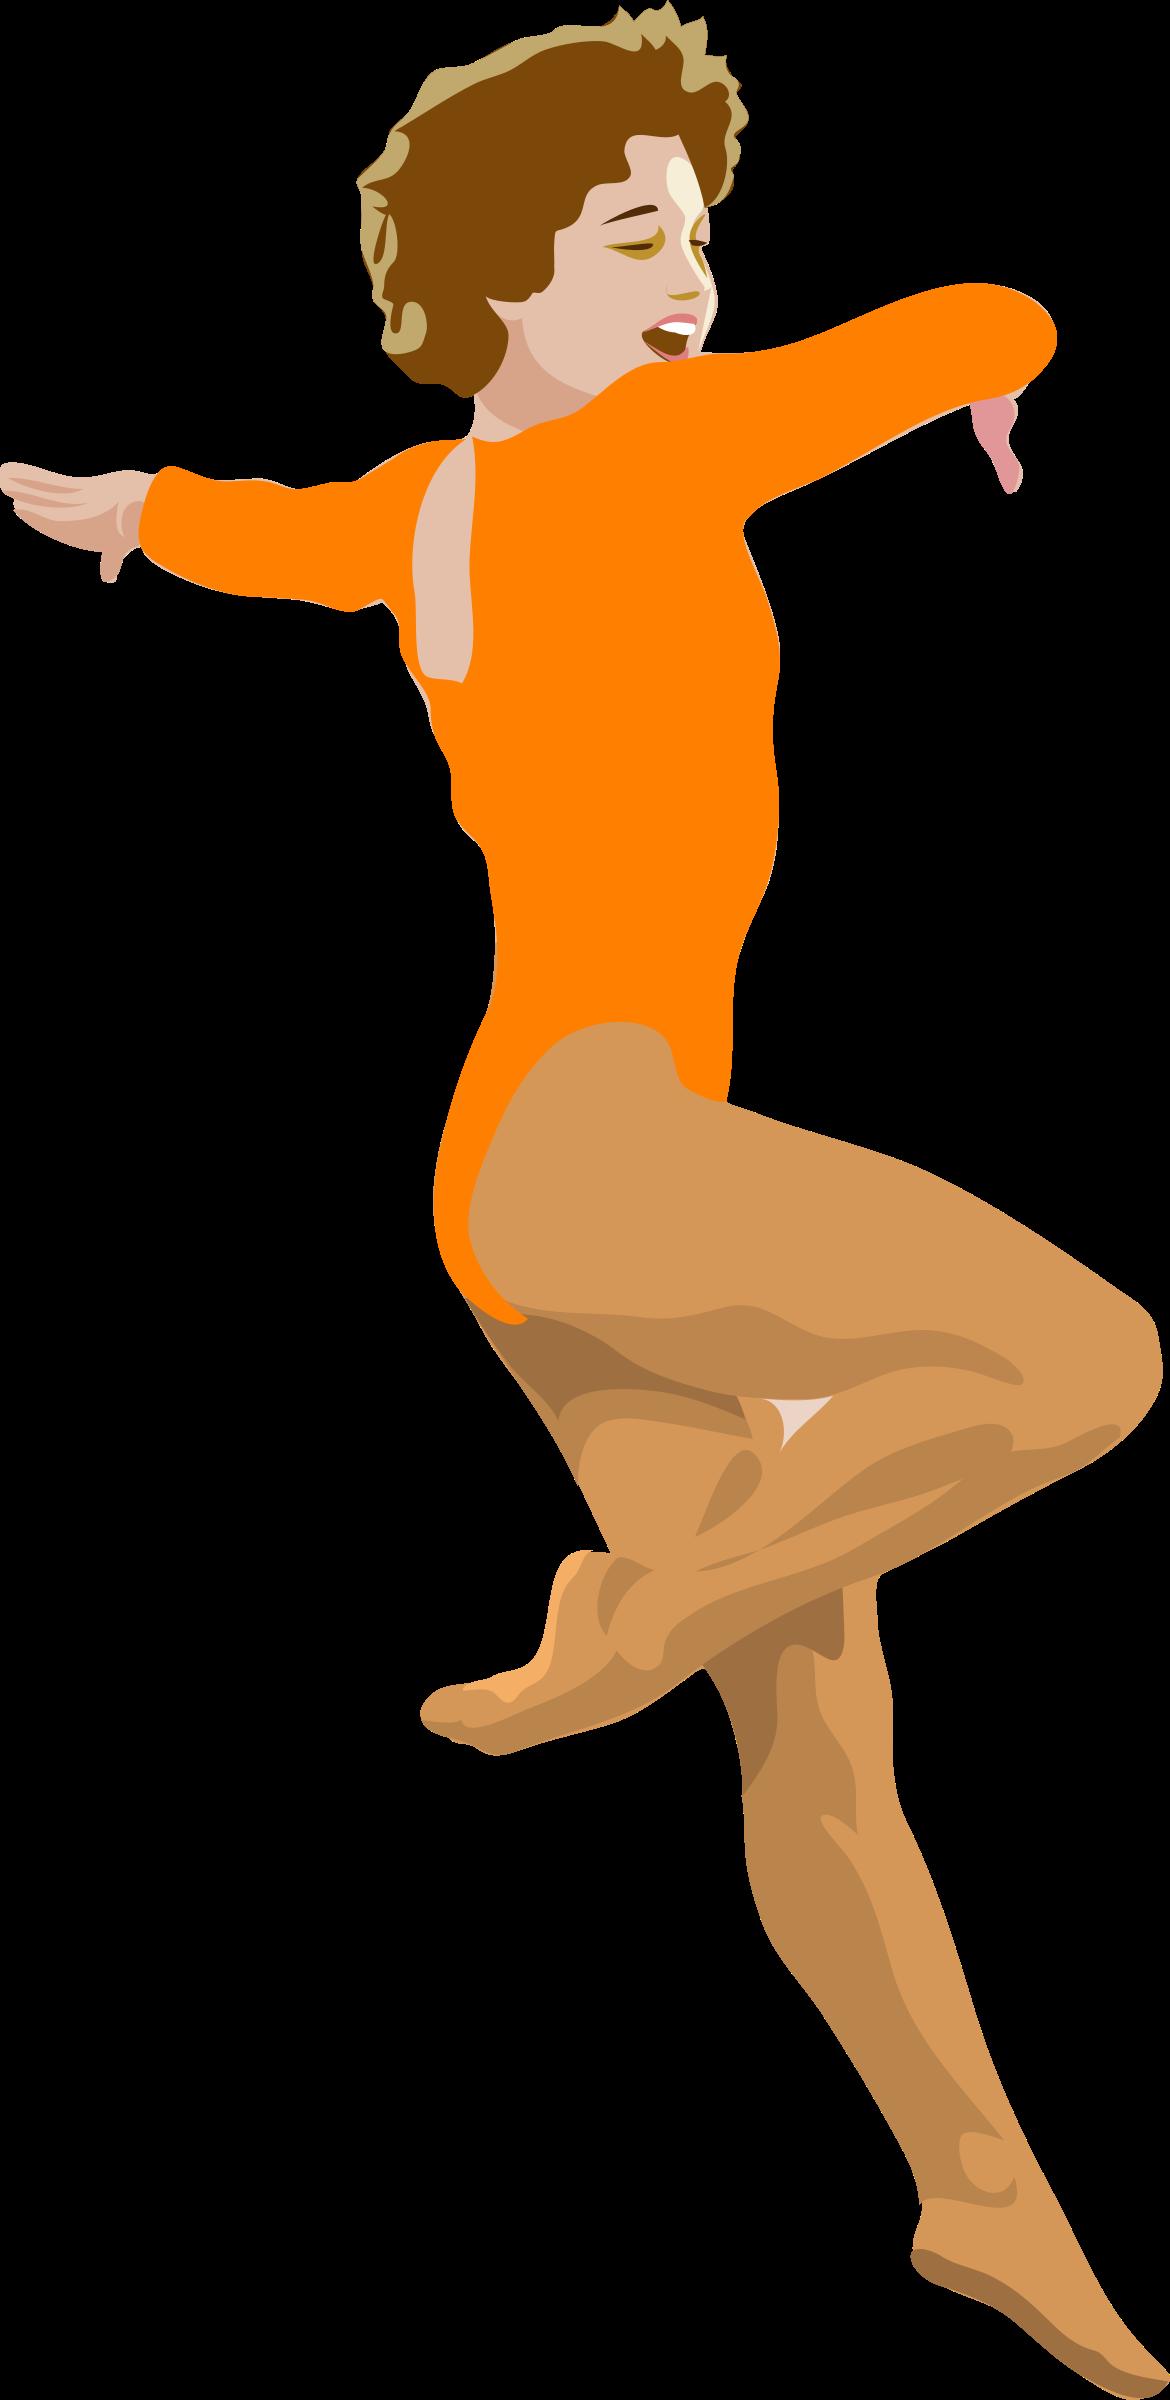 Gymnast clipart ballet. Architetto ballerina big image